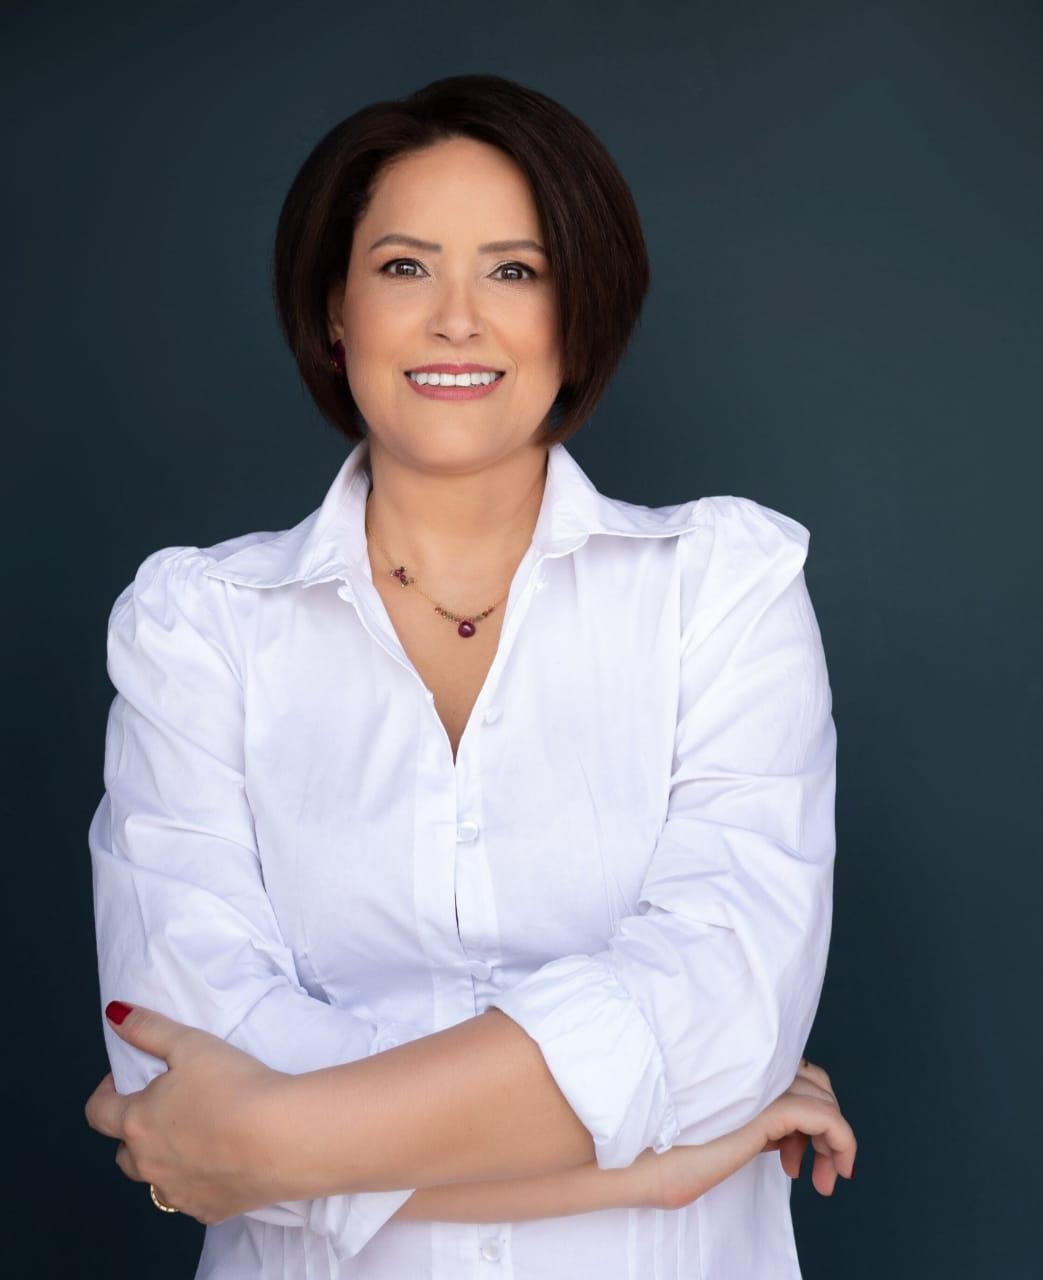 Carla Marie